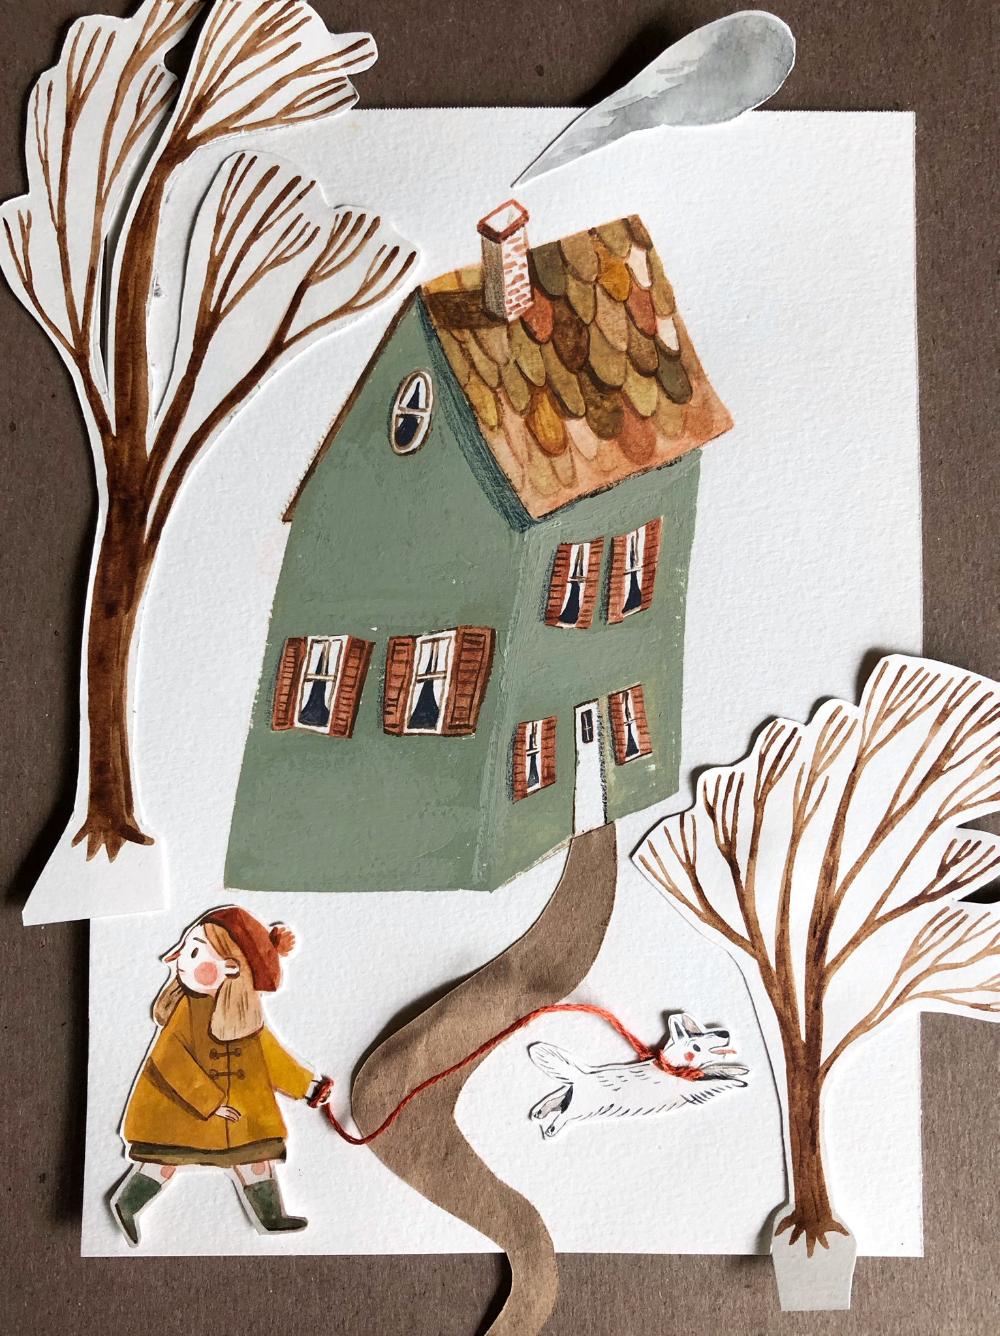 Mediatweets Door Taryn Taryndraws Twitter Children Book Illustration Watercolor Collage Illustration Illustration Art